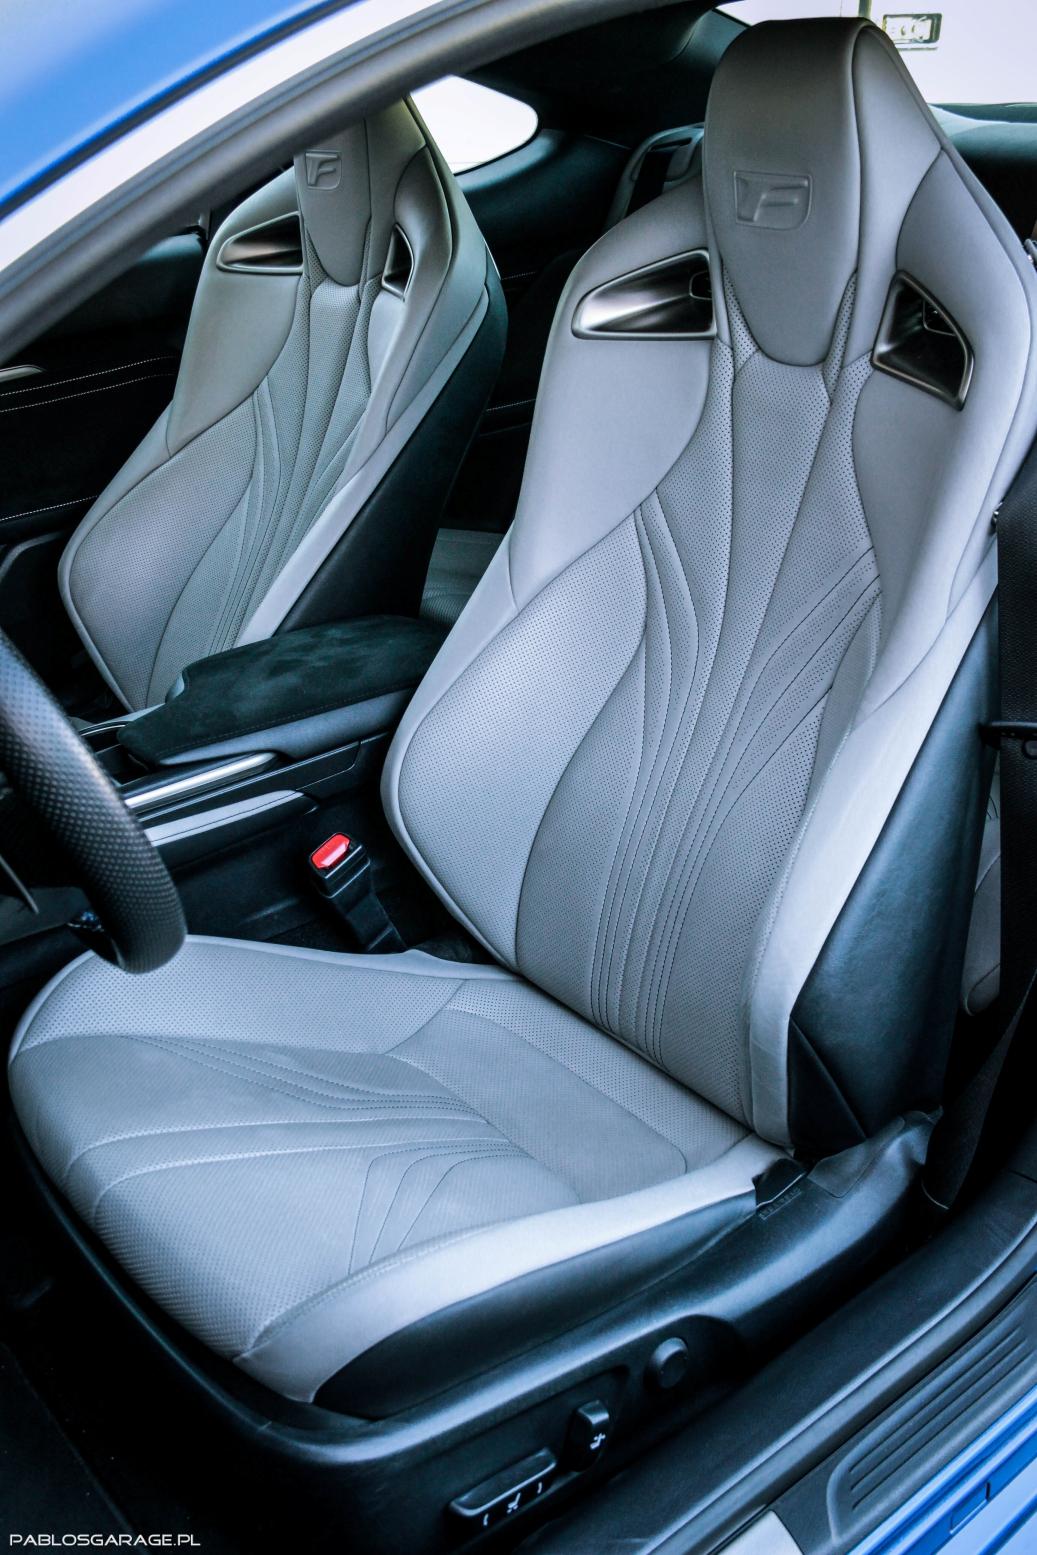 2018 Lexus RC F 5.0 V8